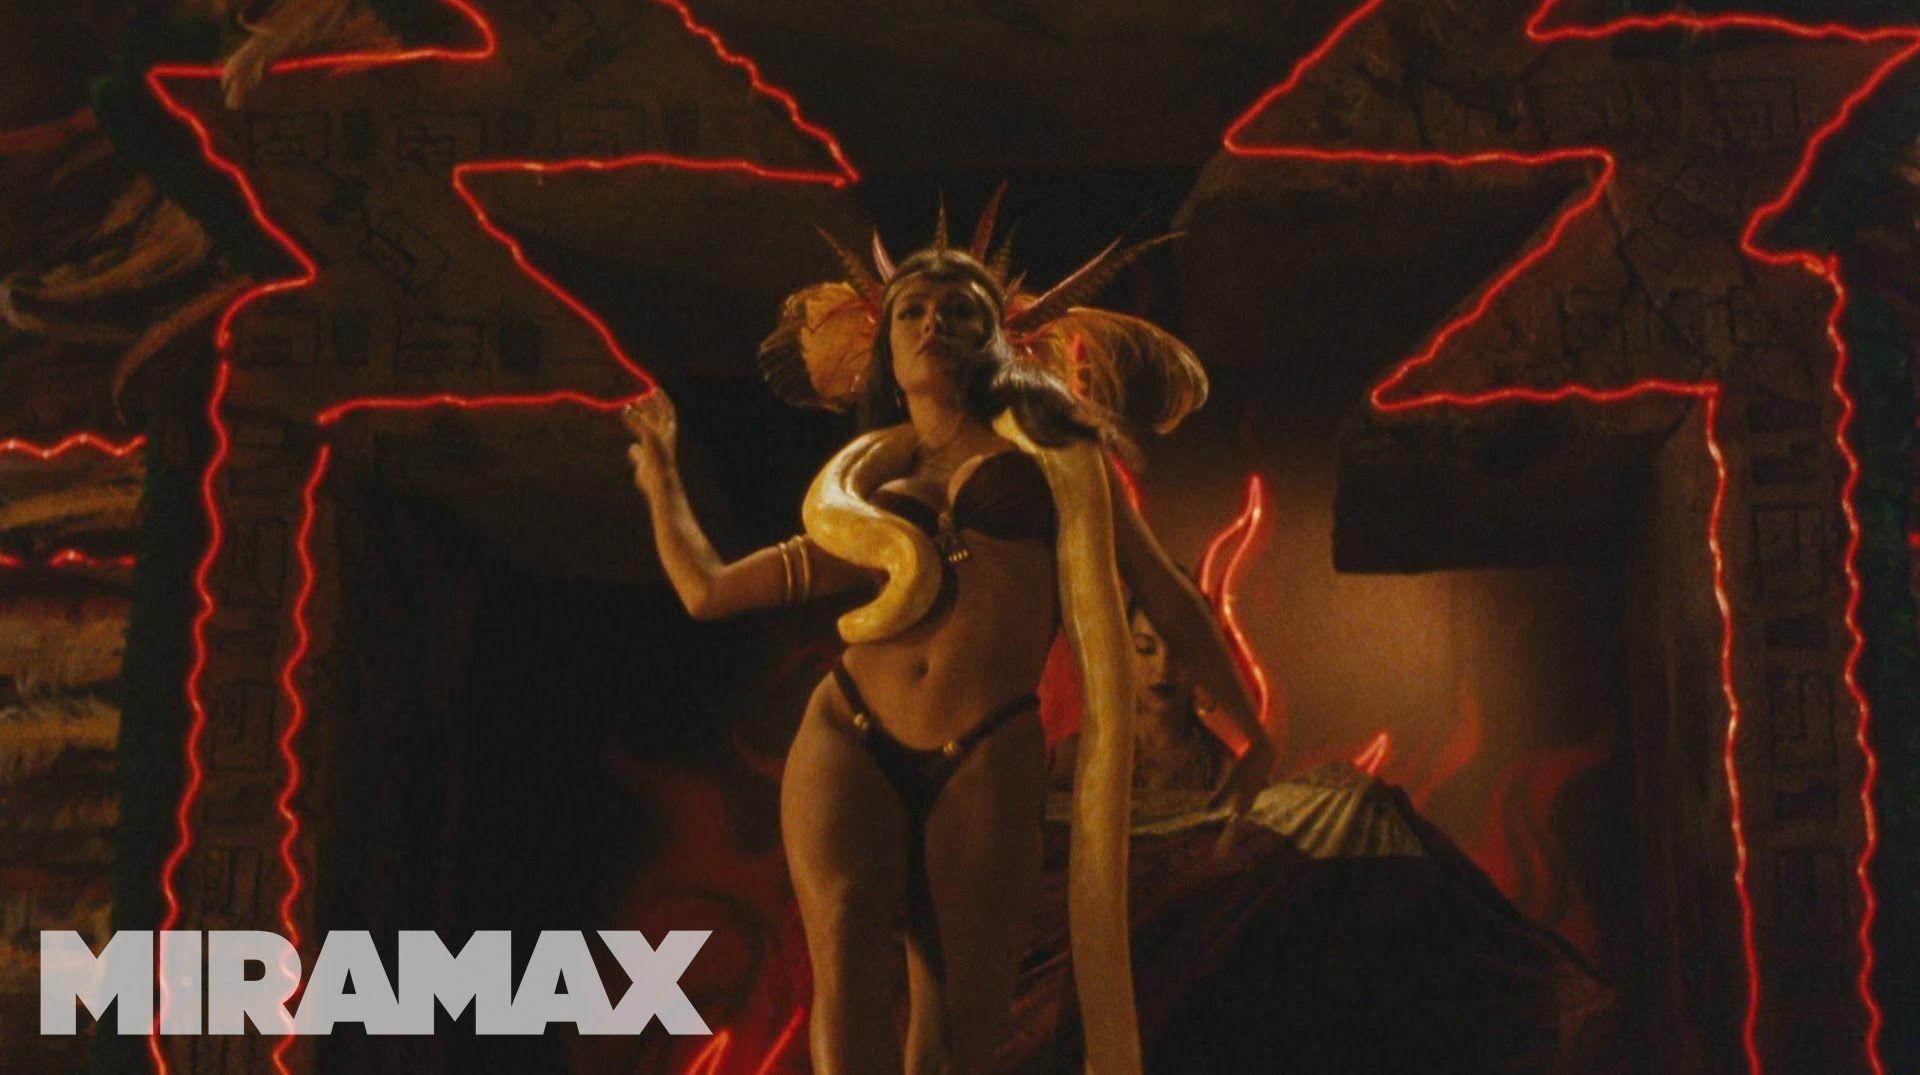 From Dusk Till Dawn The Art Of Seduction Hd Miramax Dusk